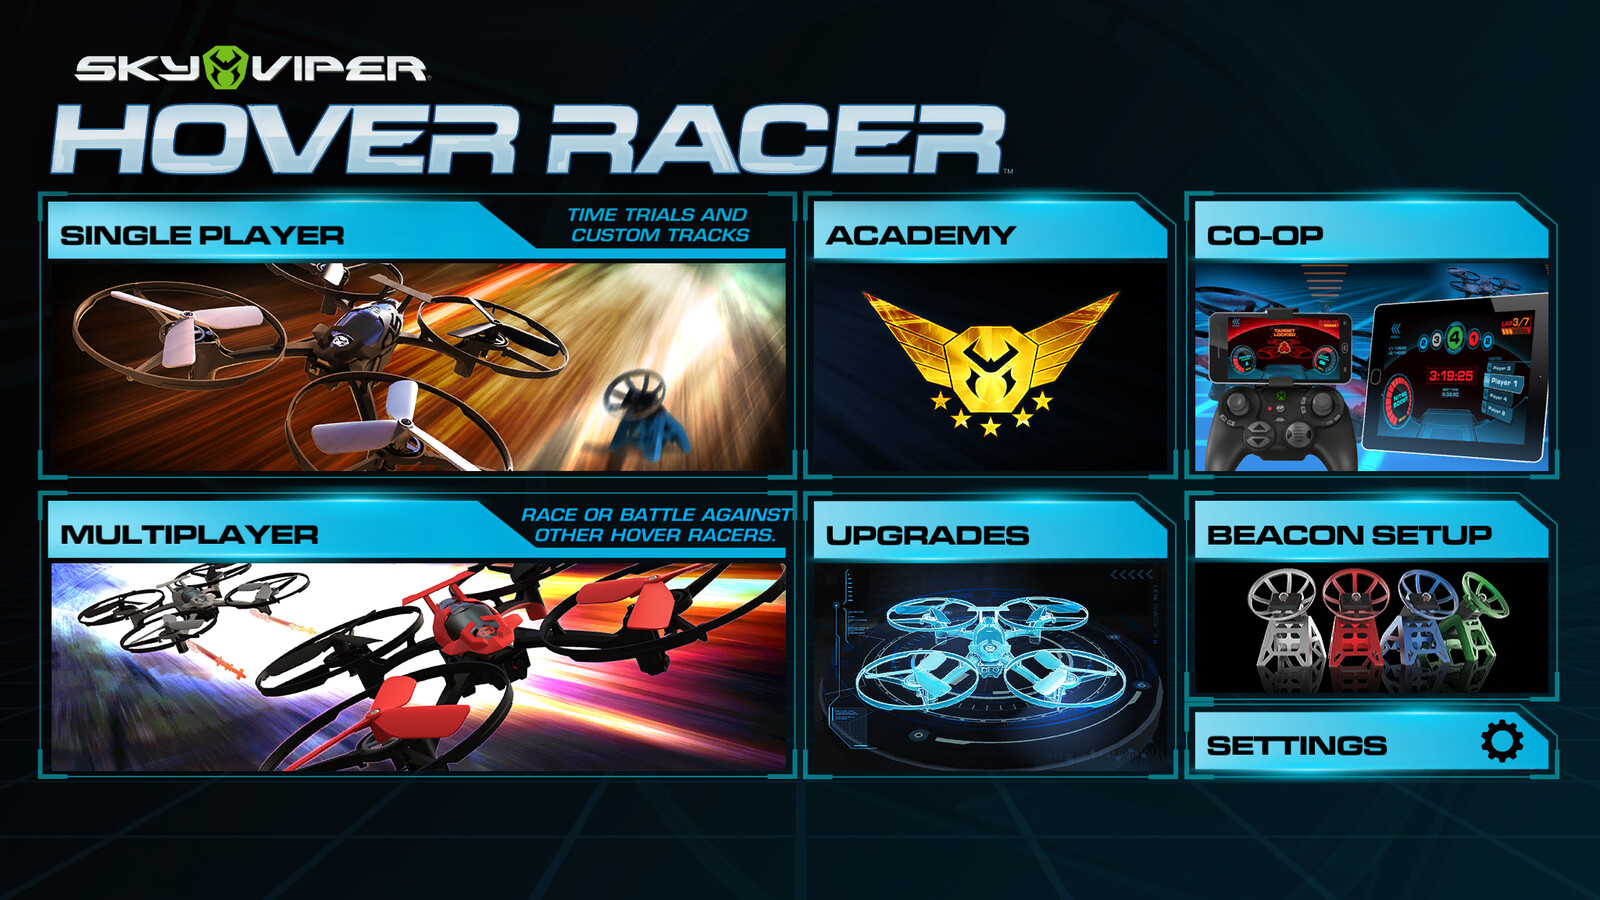 2016 - Hover Racer companion app.